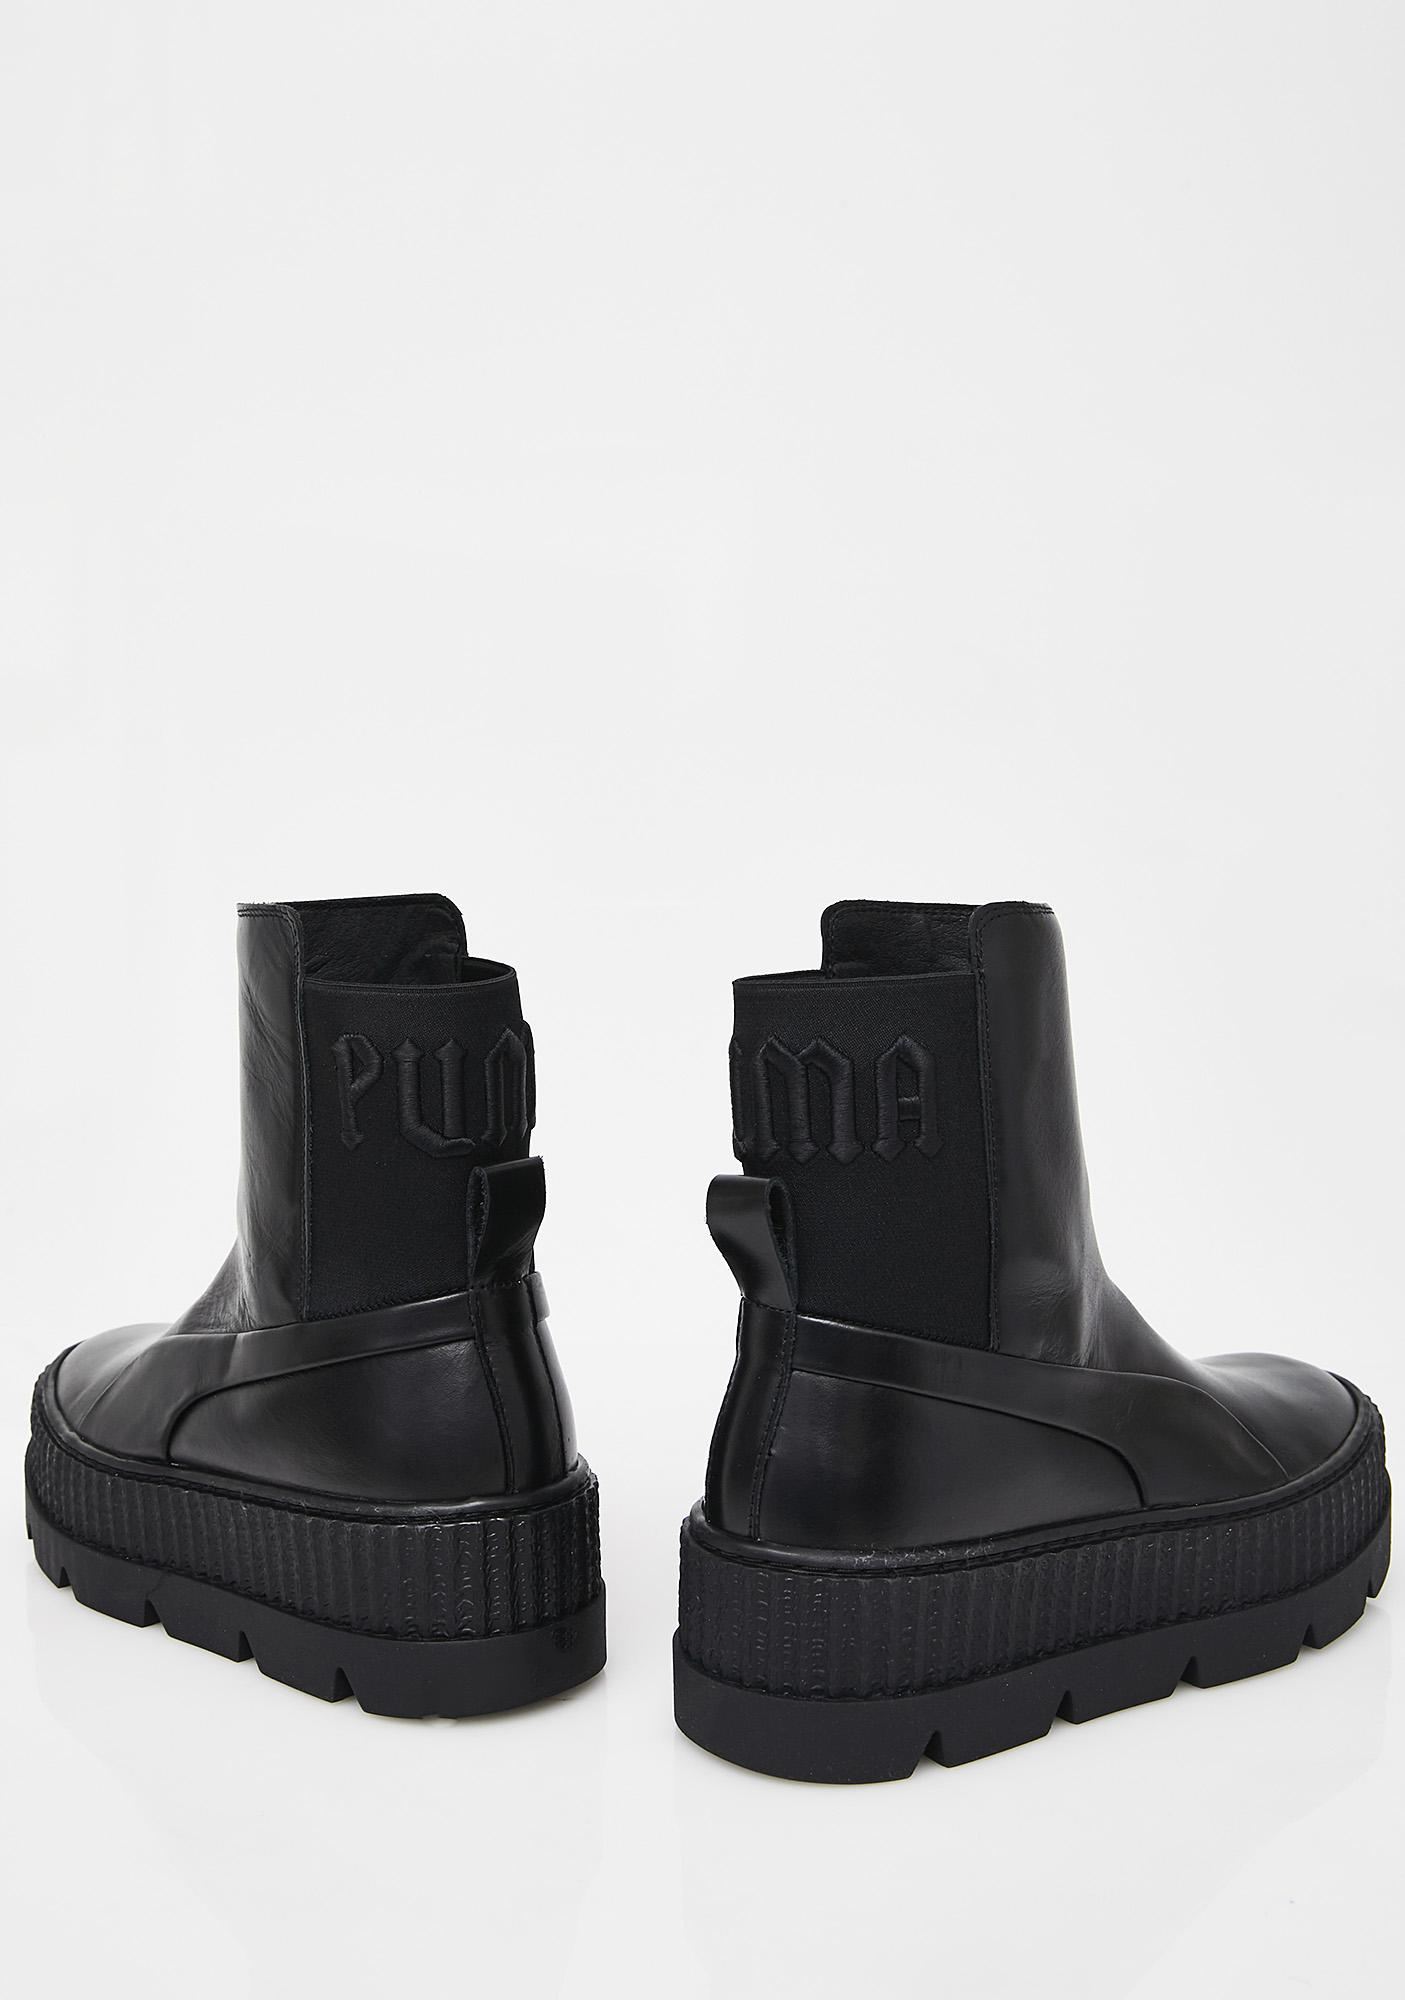 6f72b49f6eabe3 ... PUMA FENTY PUMA By Rihanna Chelsea Sneaker Boots ...